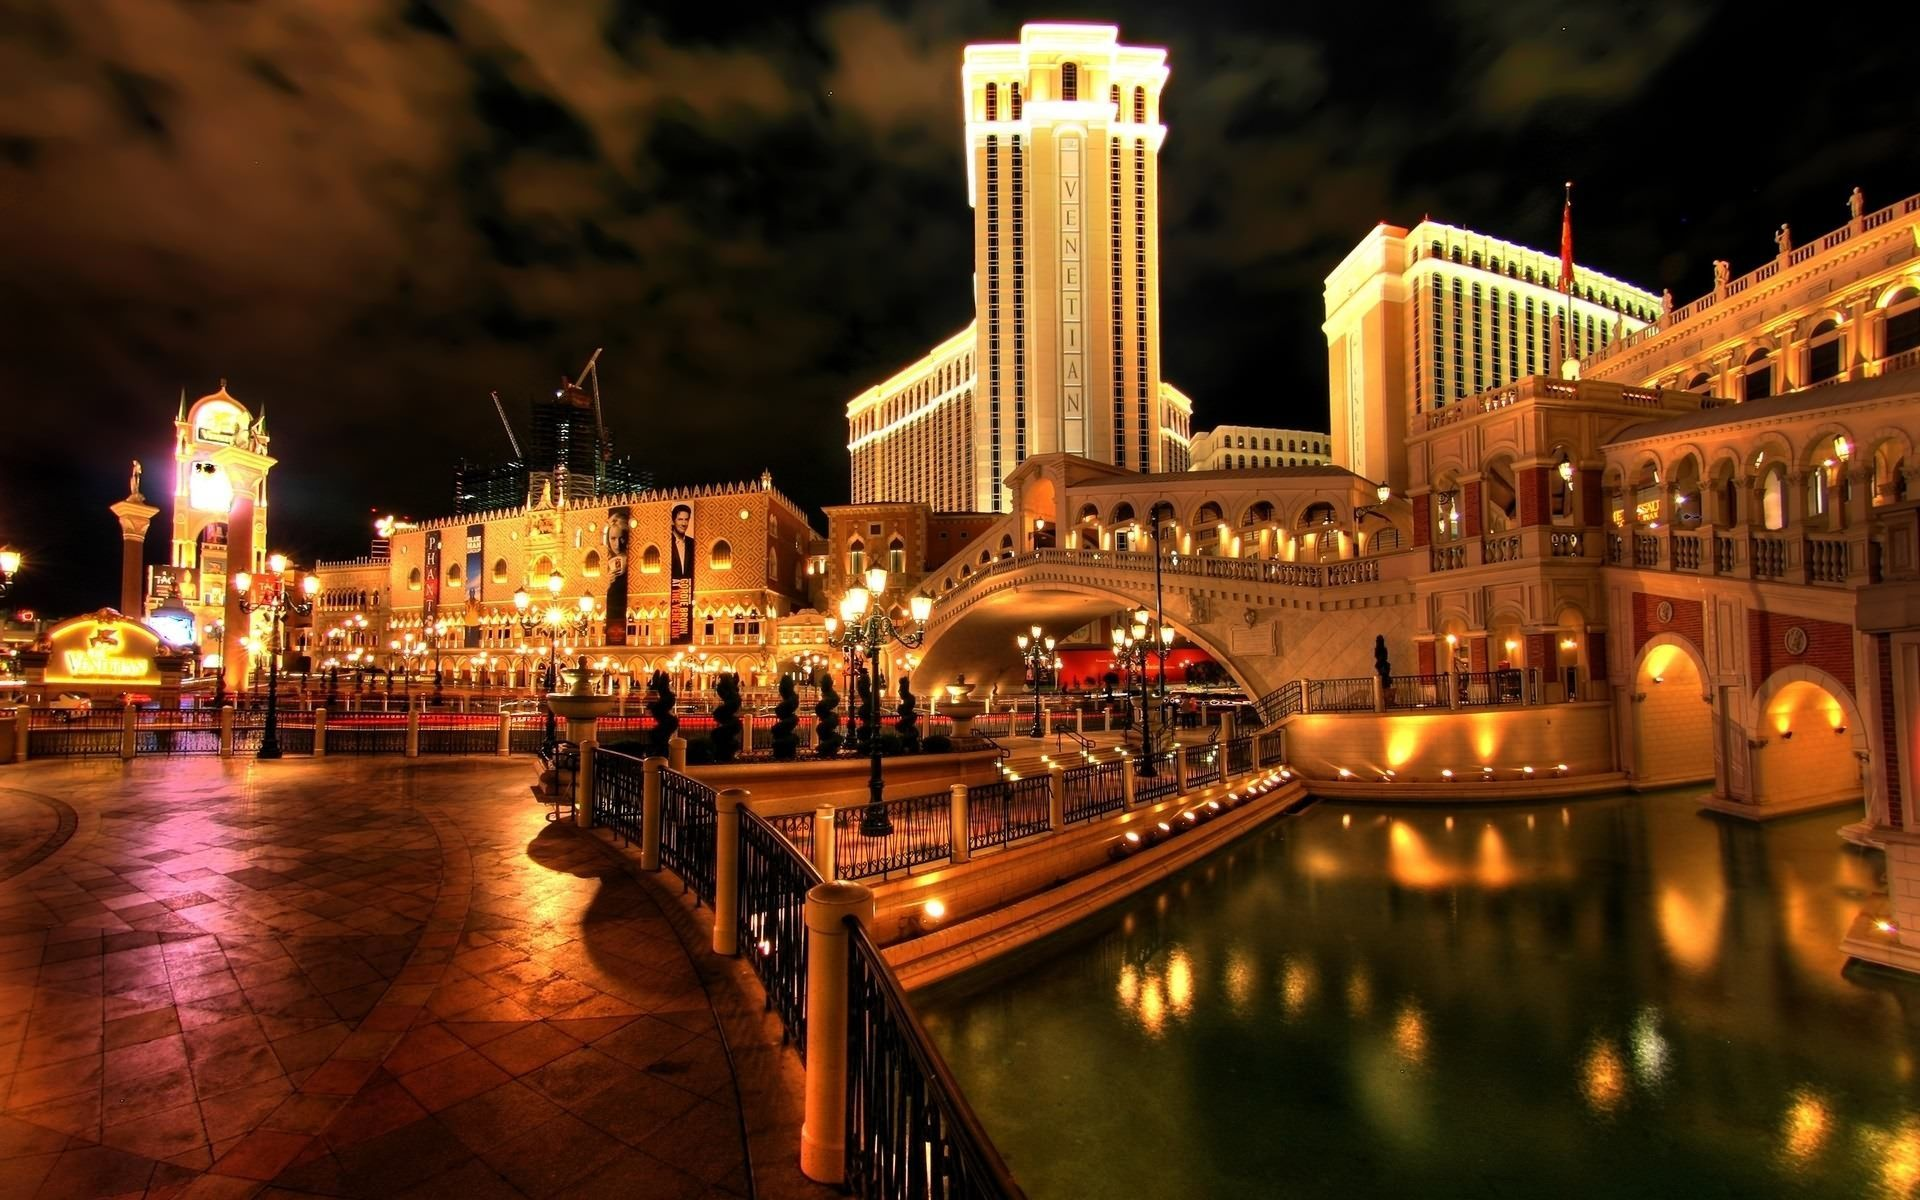 Italian casino las vegas play free online stick figure penalty chamber 2 games